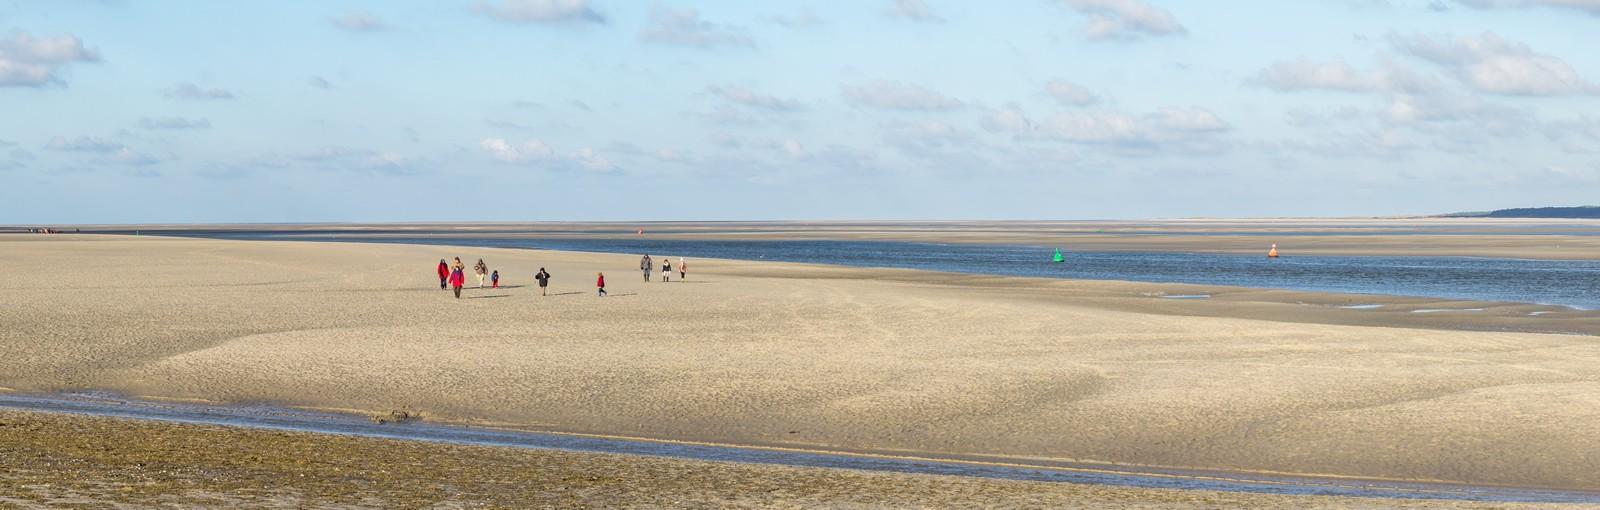 Baie de Somme - Le Hourdel